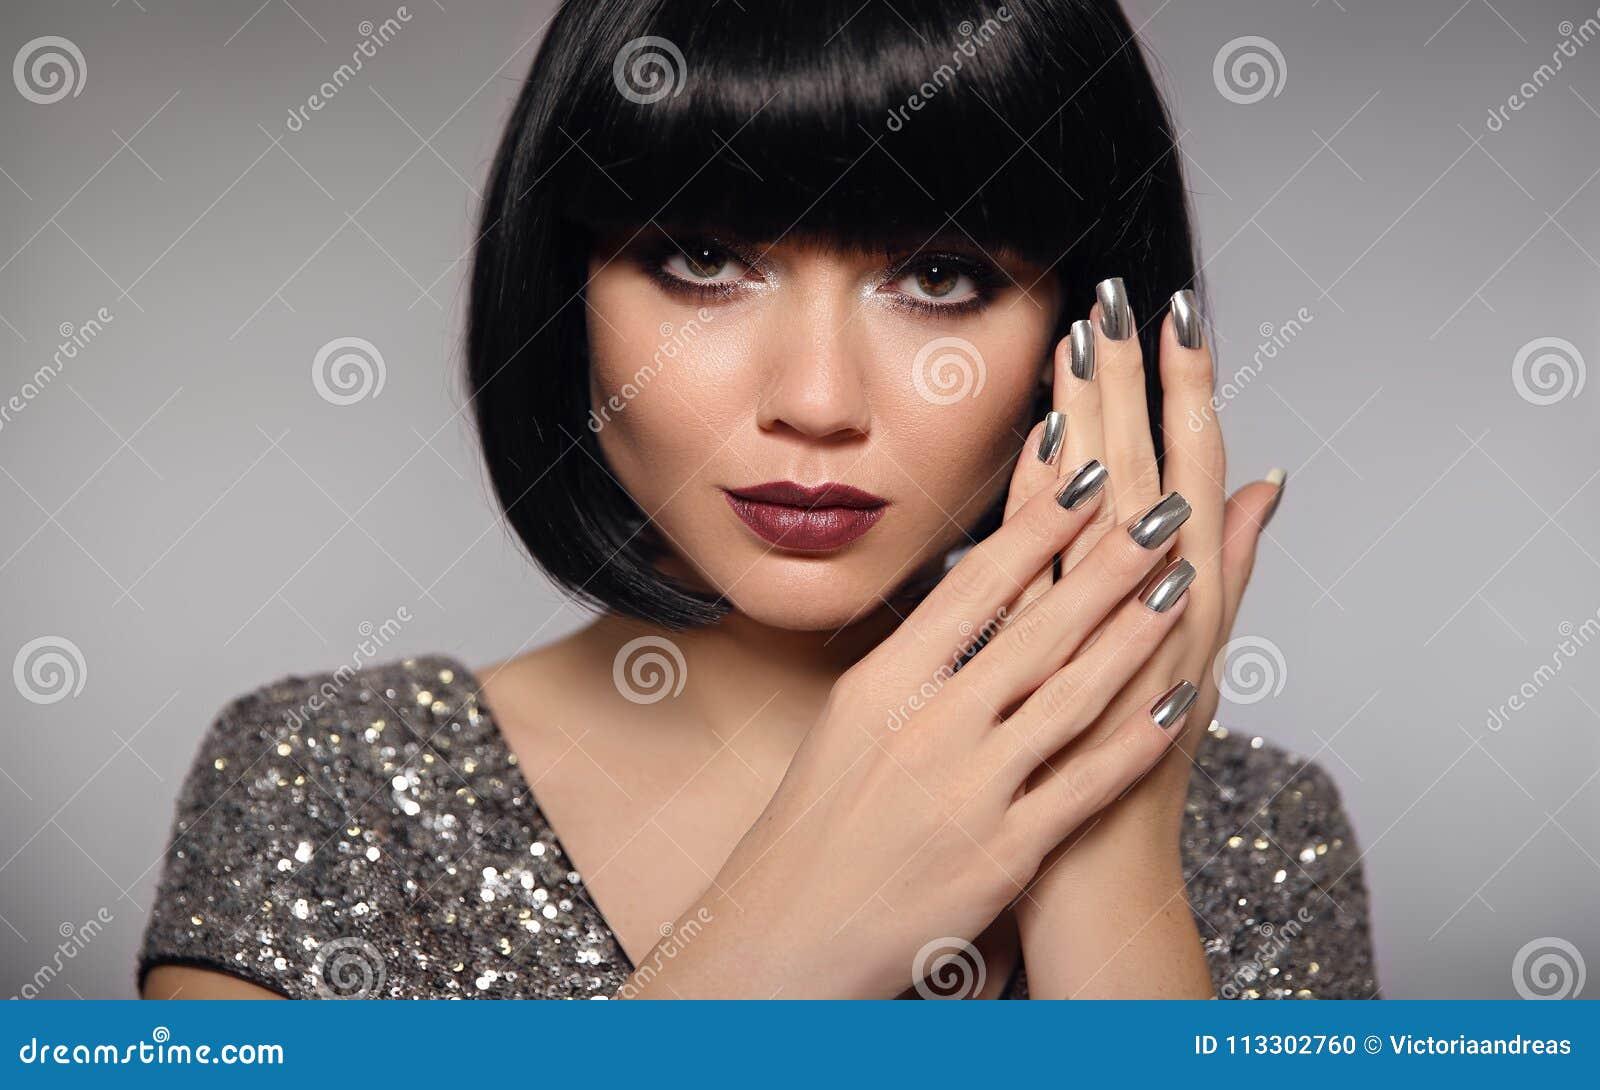 Silver Nail Art Polish Manicure Short Bob Hair Woman Model Fas